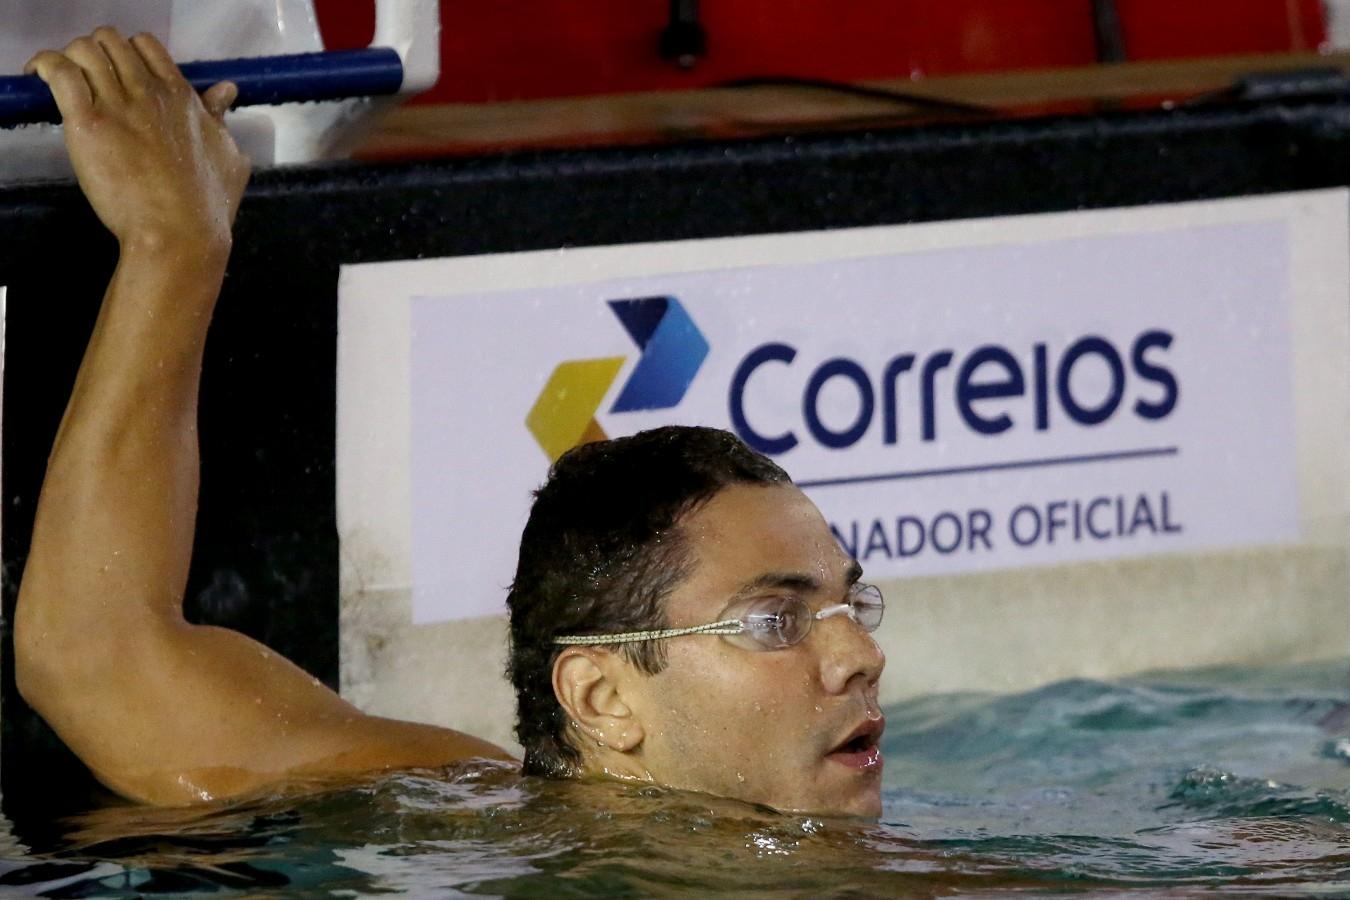 Trofeu Jose Finkel de Natacao no Clube Internacional de Regatas. 15 de Setembro de 2016, Santos, SP, Brasil. Foto:Satiro Sodré/SSPress.